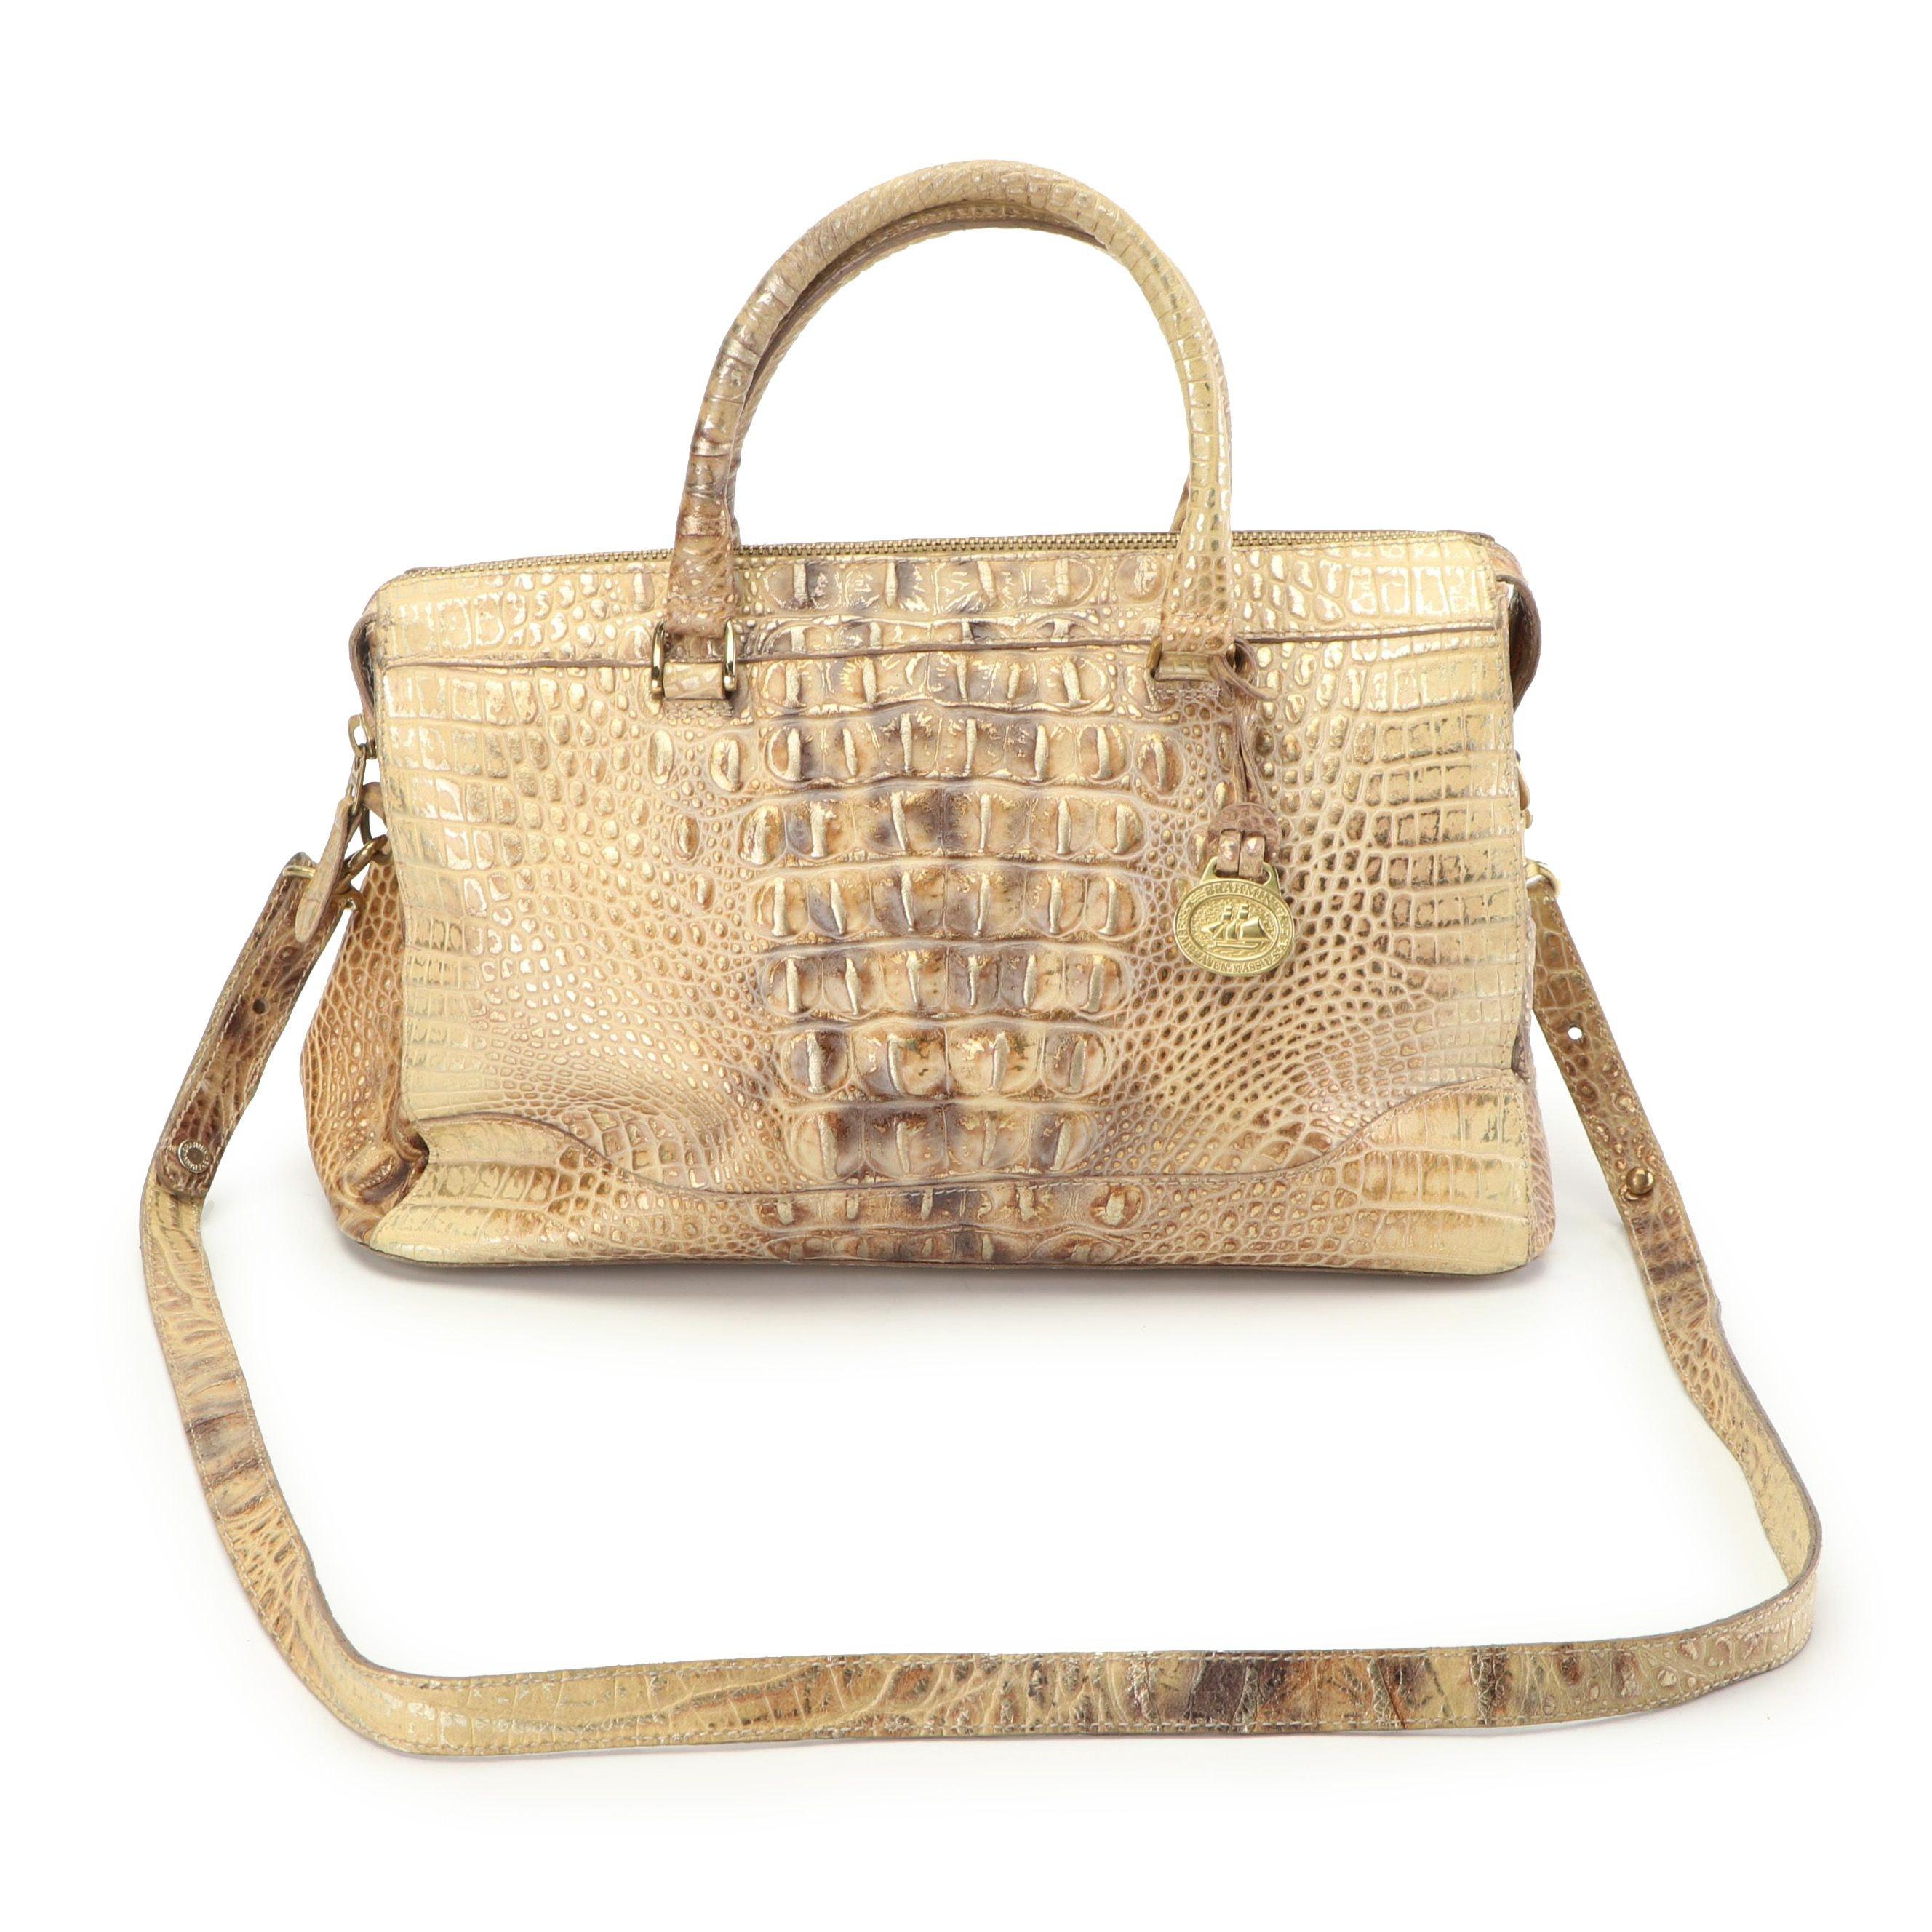 Brahmin Metallic Serengeti Croc Embossed Leather Convertible Handbag